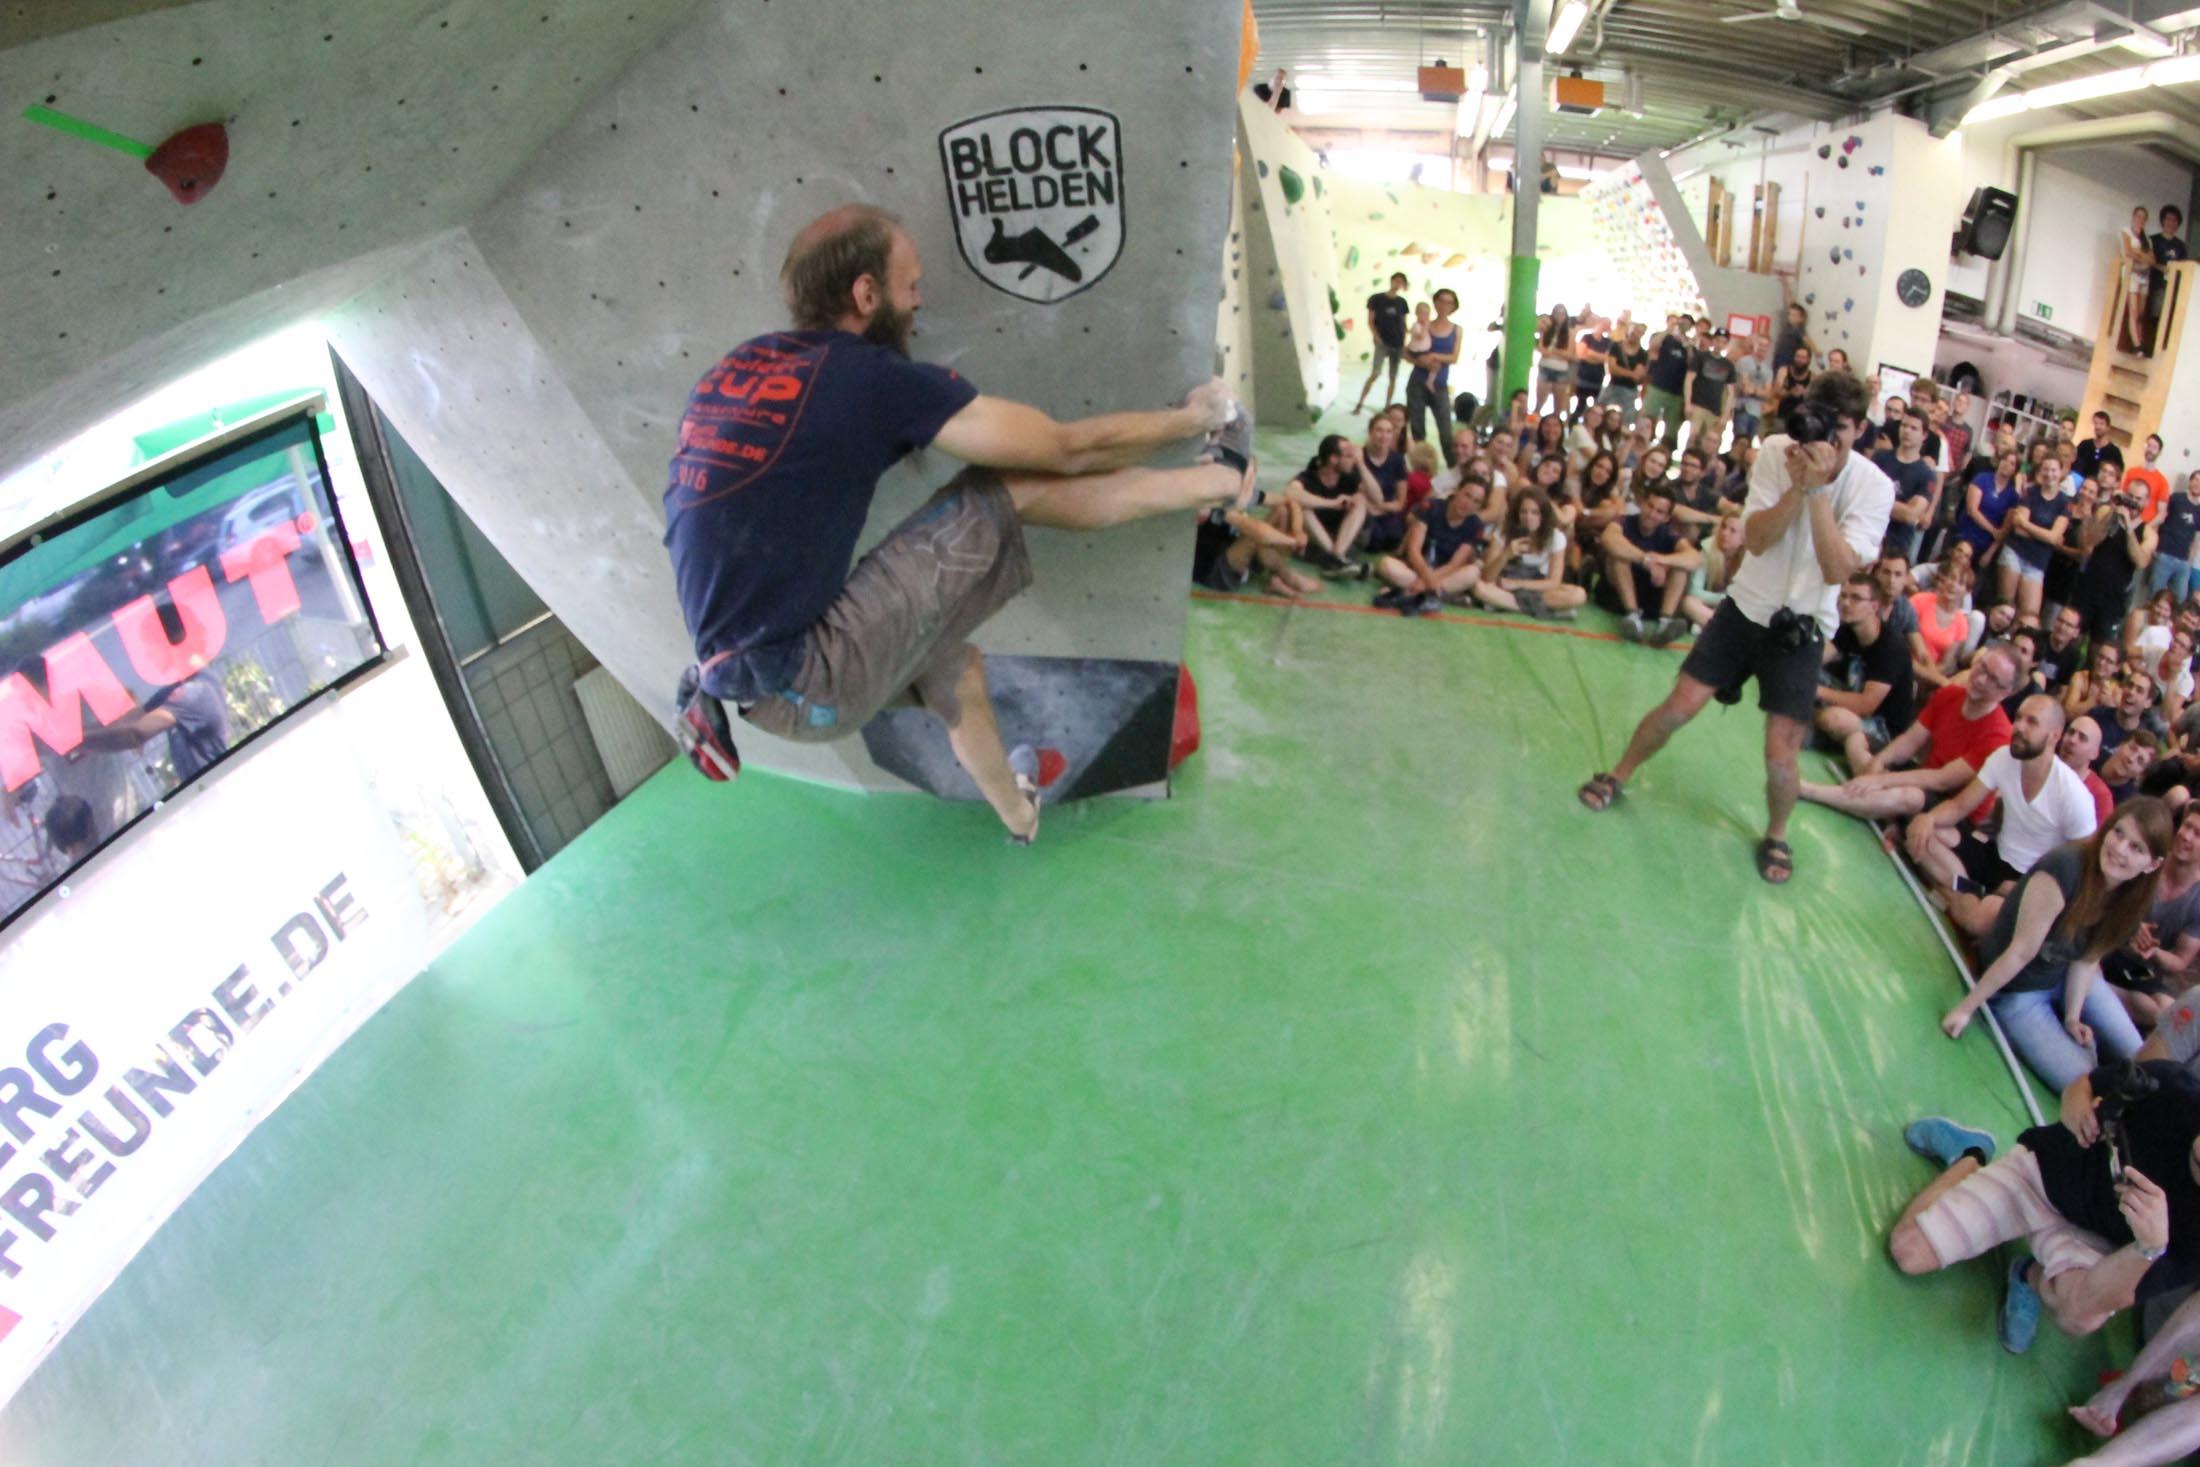 Finale, internationaler bouldercup Frankenjura 2016, BLOCKHELDEN Erlangen, Mammut, Bergfreunde.de, Boulderwettkampf07092016598